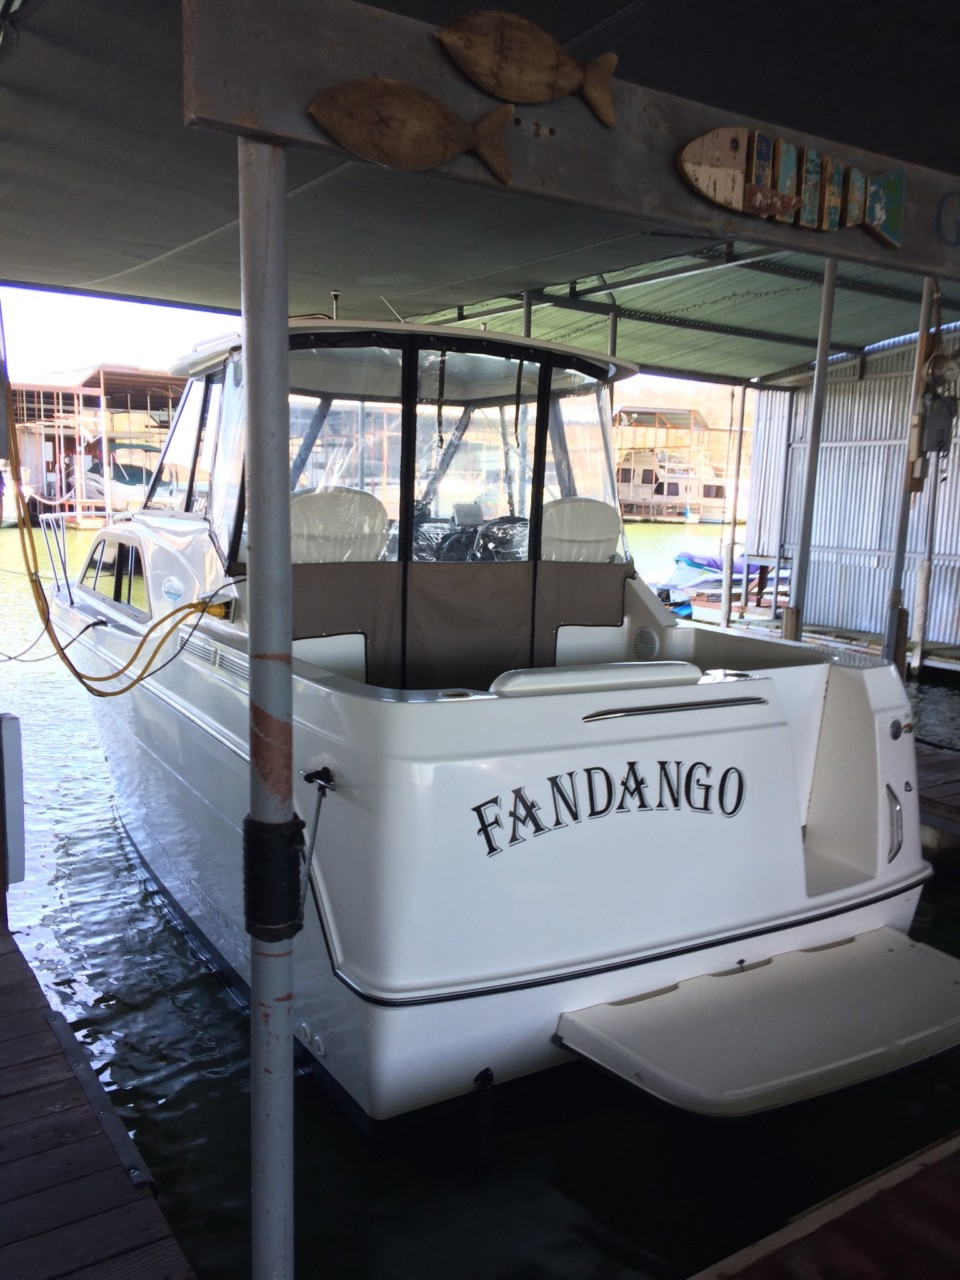 http://eisenhoweryachtclub.com/wp-content/uploads/Boat1.jpg